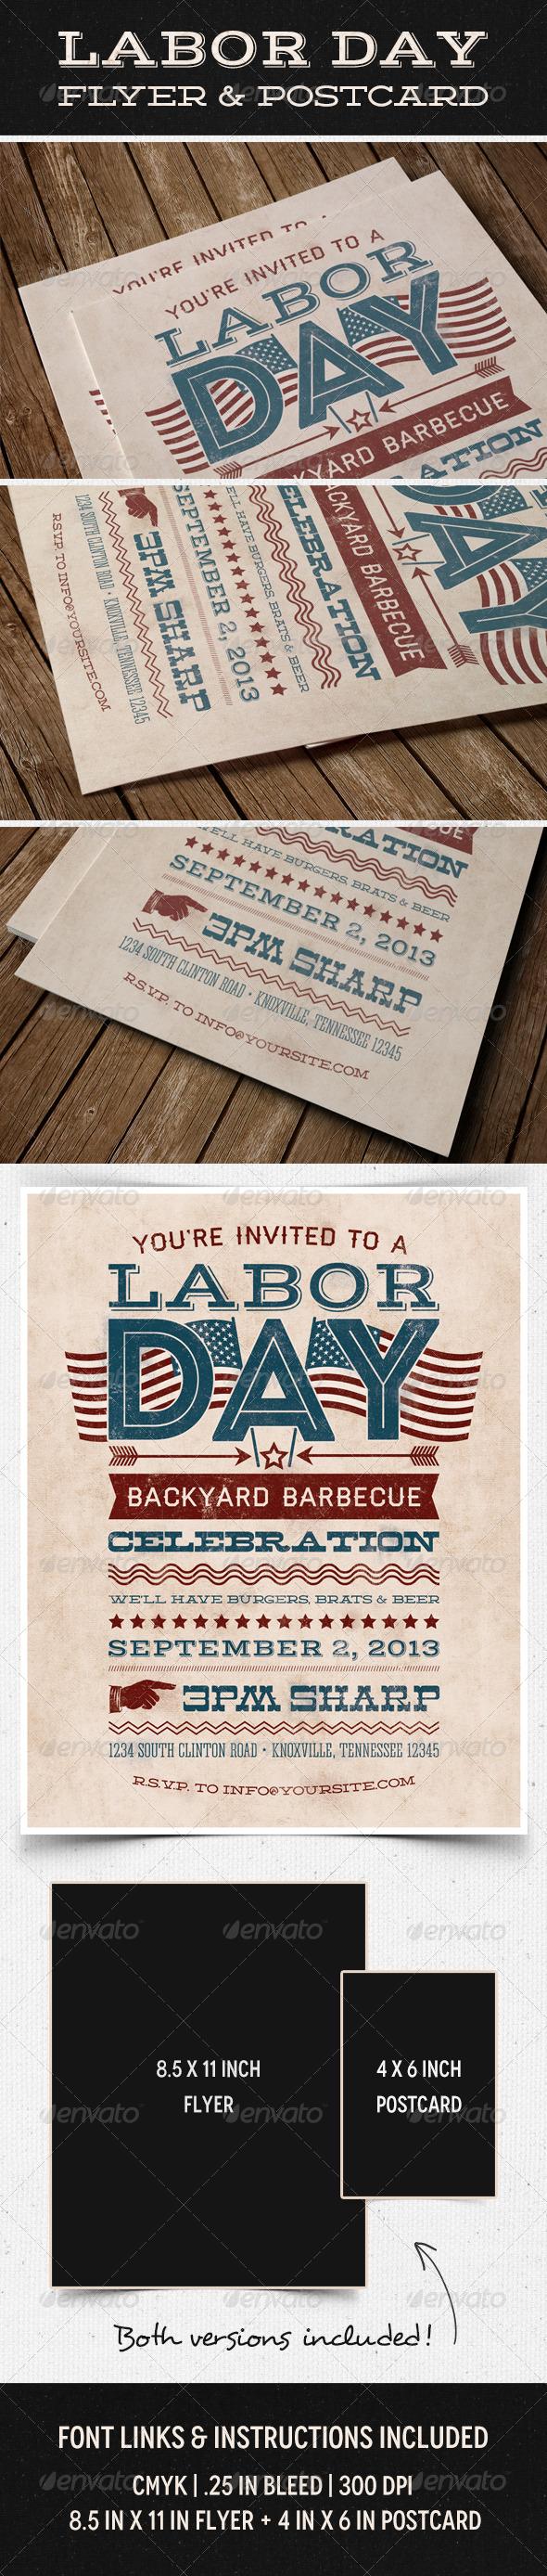 Labor Day Flyer & Postcard